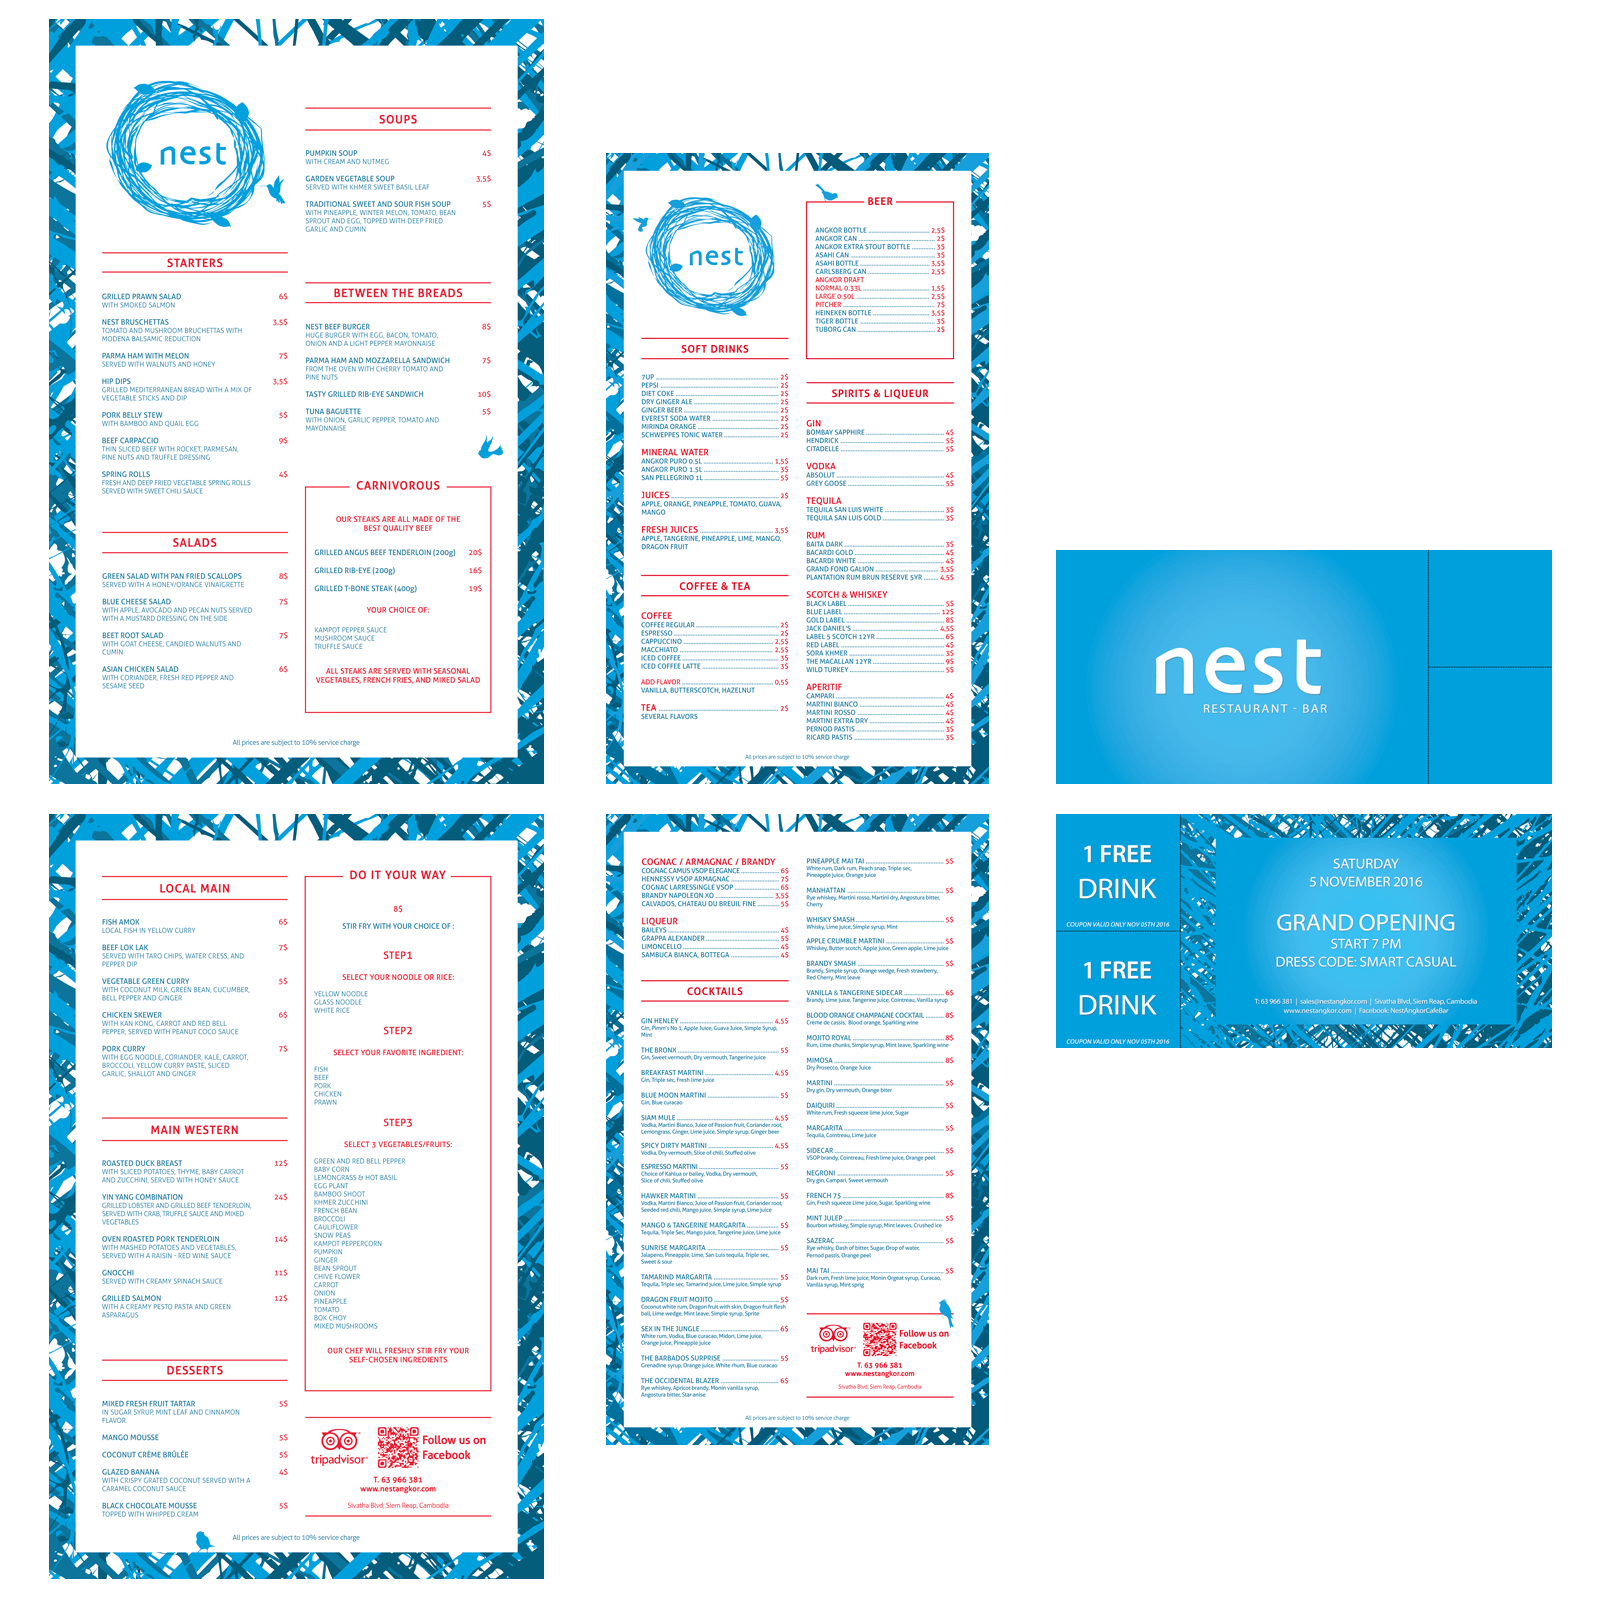 Food and Drink Menus, Invitation Card - Nest Restaurant - Siem Reap